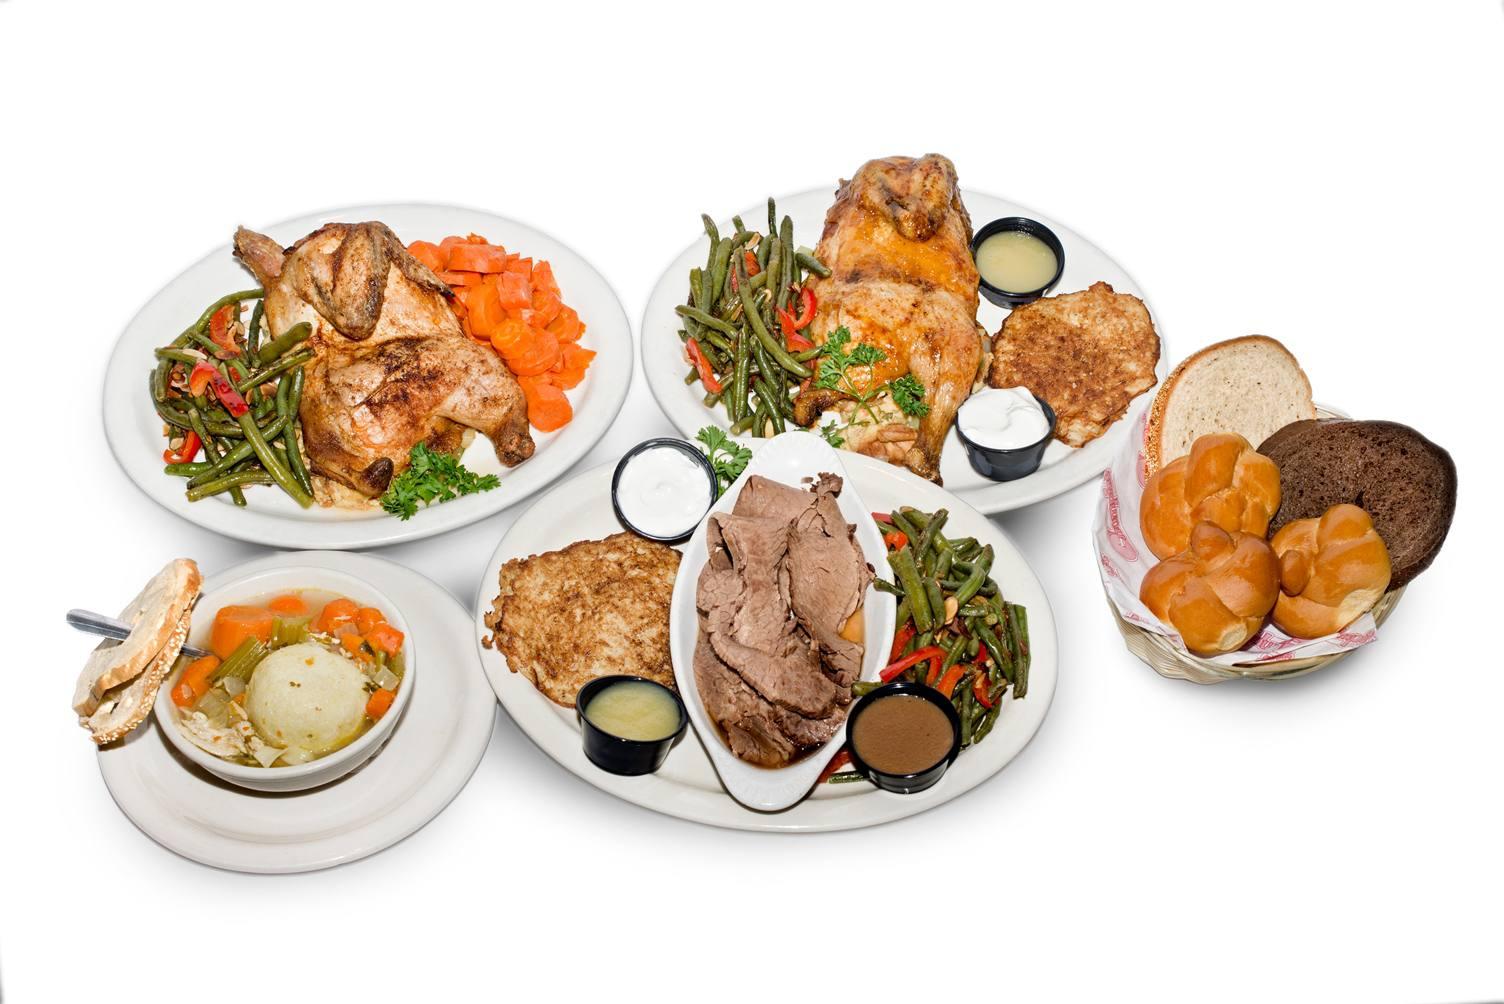 Chompie's dinner spread